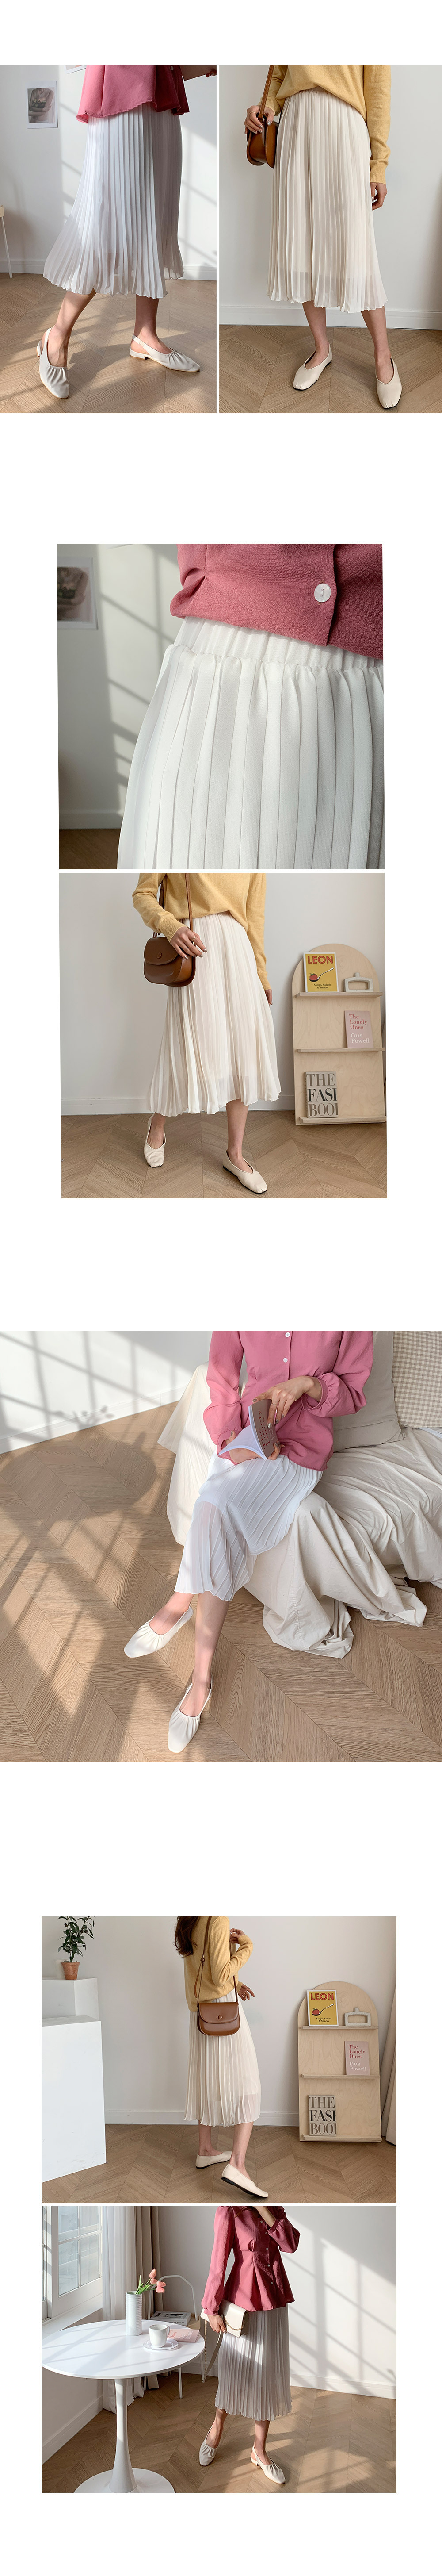 Miring pleated long skirt